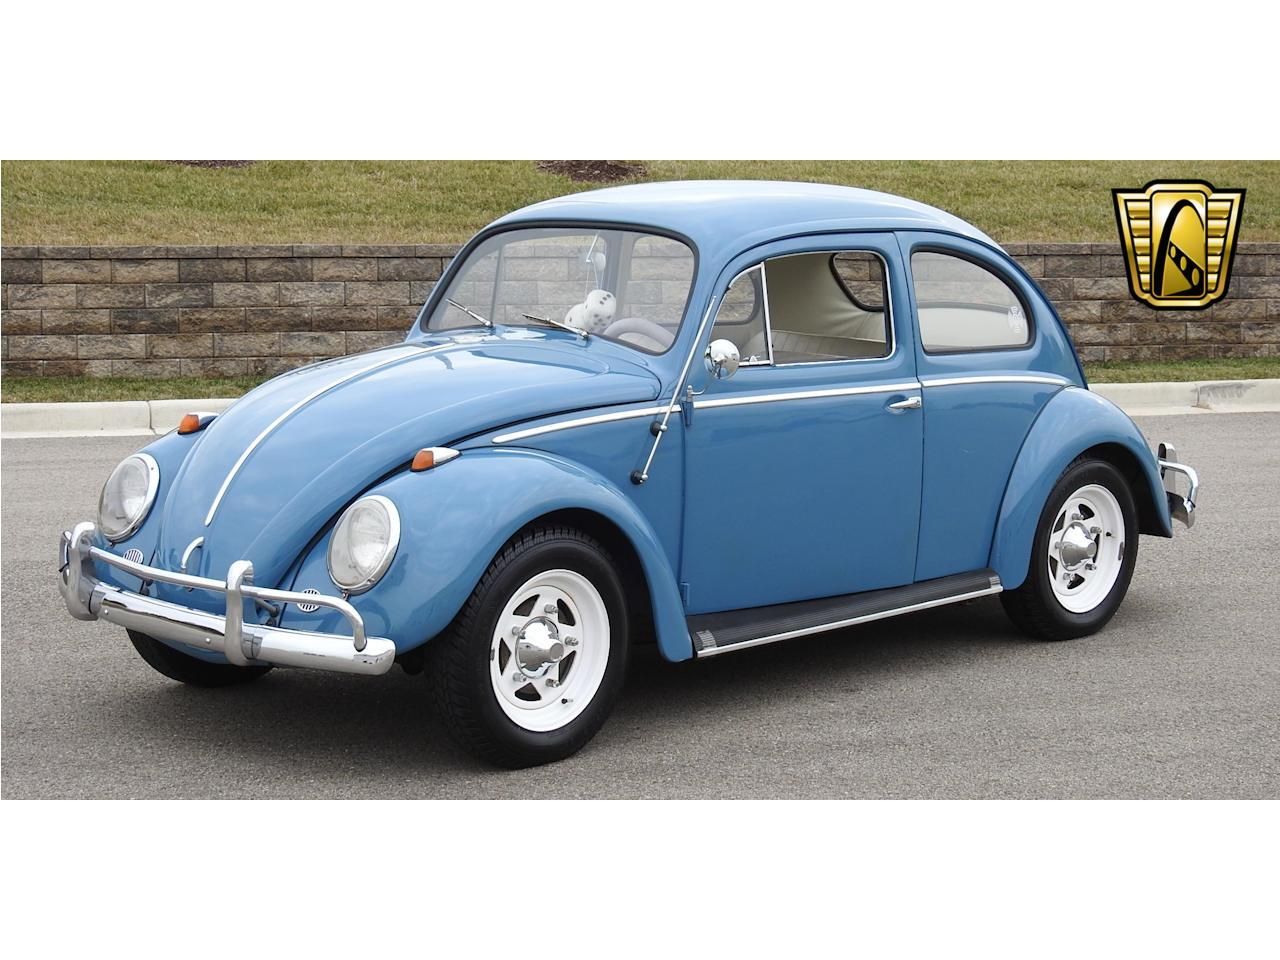 1959 Volkswagen Beetle For Sale Classiccars Com Cc 1032131